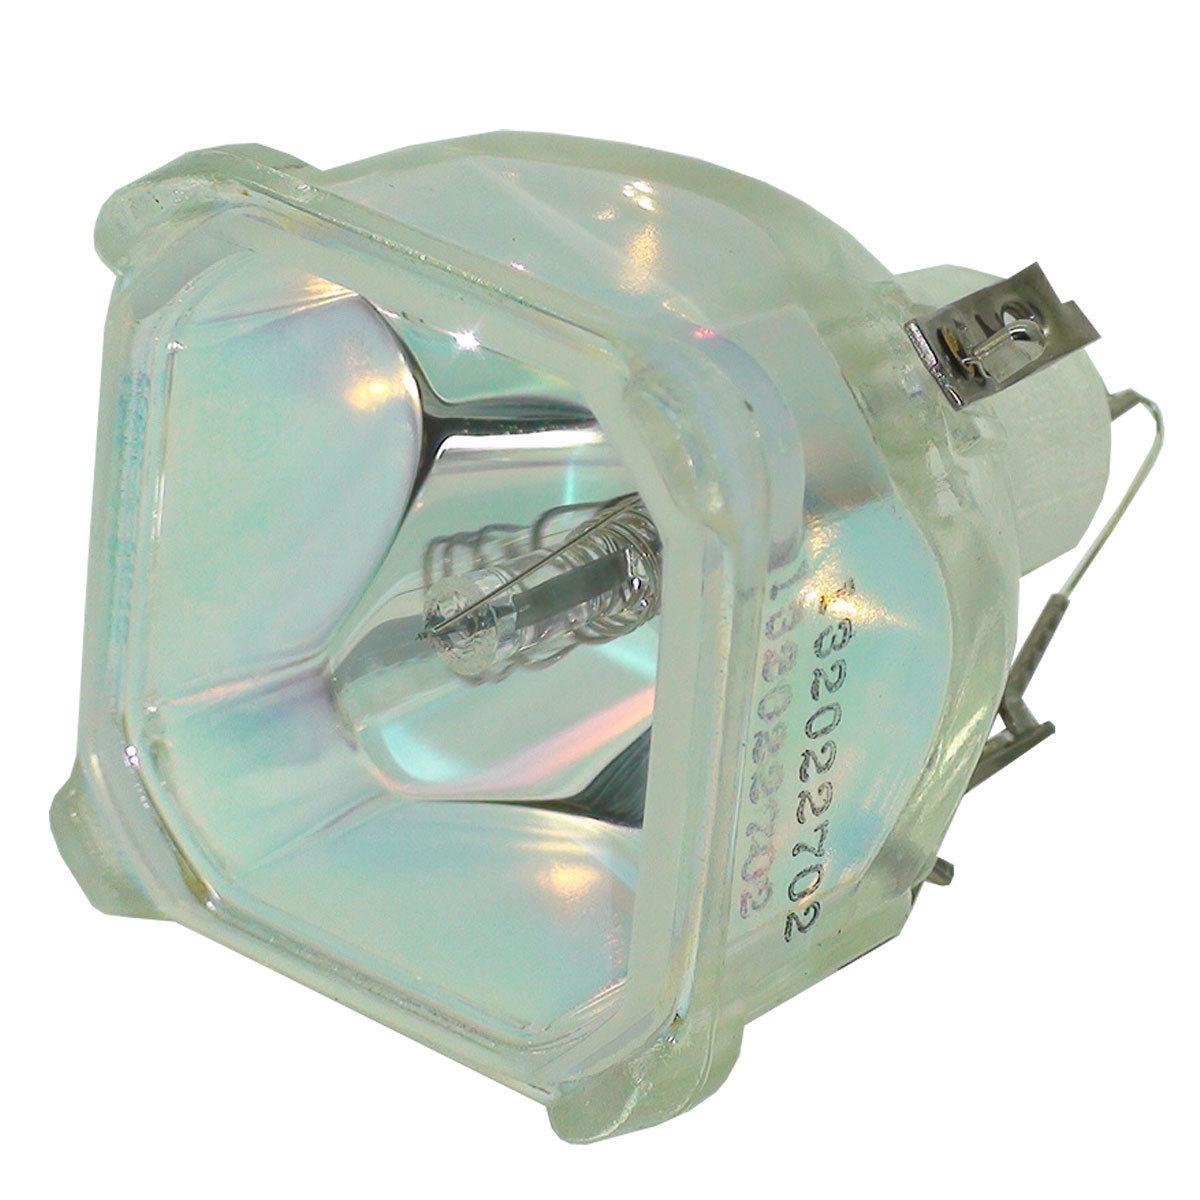 Compatible Bare Bulb DT00511 for Hitachi CP-HS1050 CP-HS1060 CP-HX1090 CP-HX1095 CP-HX1098 CP-S317W CP-S318W Projector Lamp Bulb free shipping compatible projector lamp for hitachi cp s318w